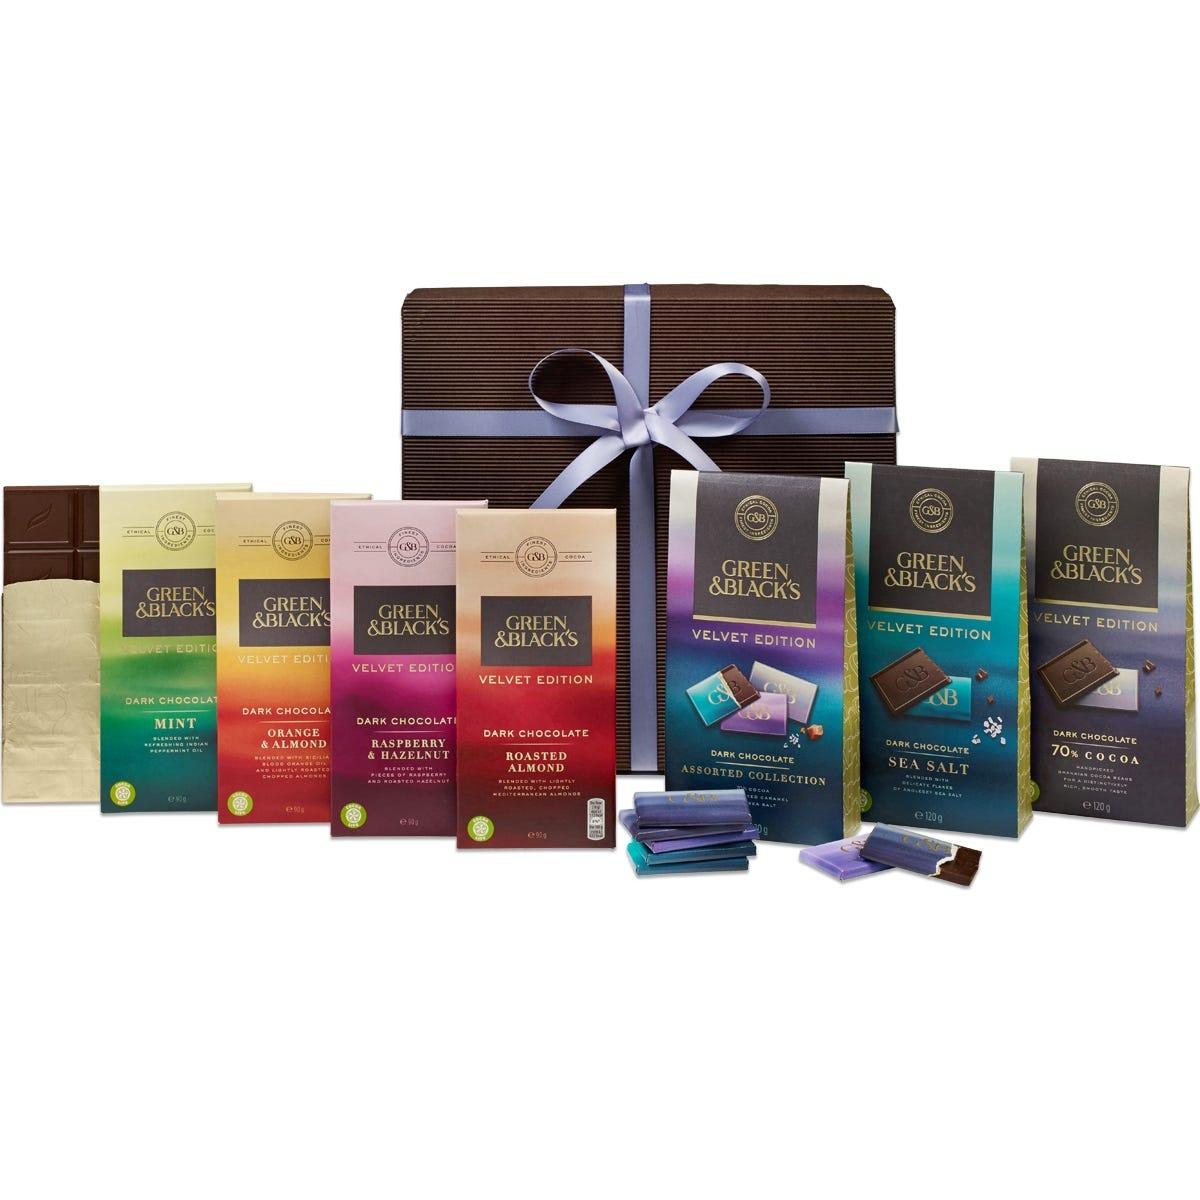 G&B's Velvet Edition Dark Chocolate Gift- Large